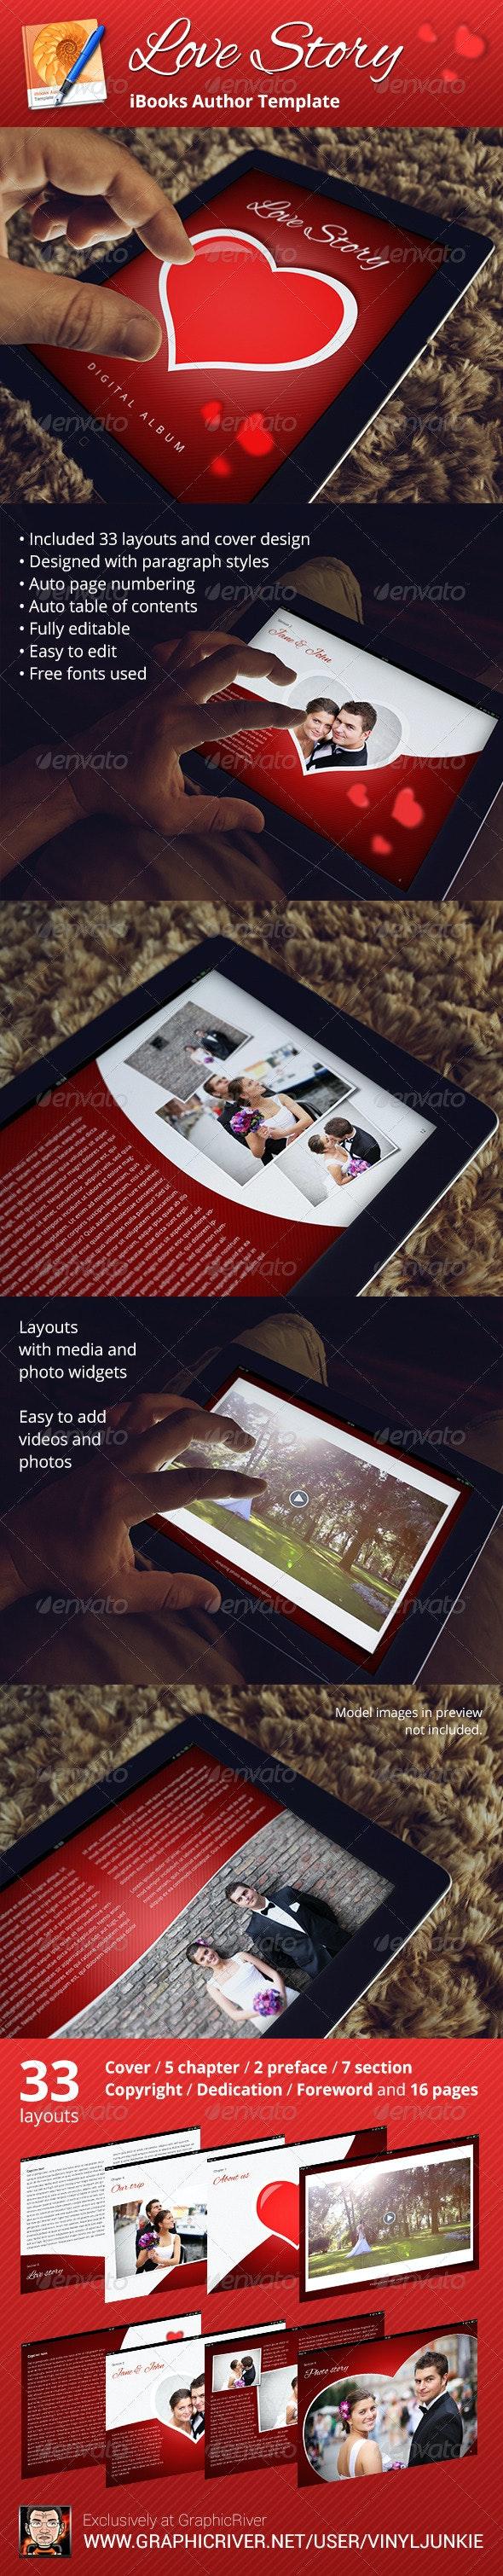 Love Story Digital Album - iBooks Author Template - Digital Books ePublishing